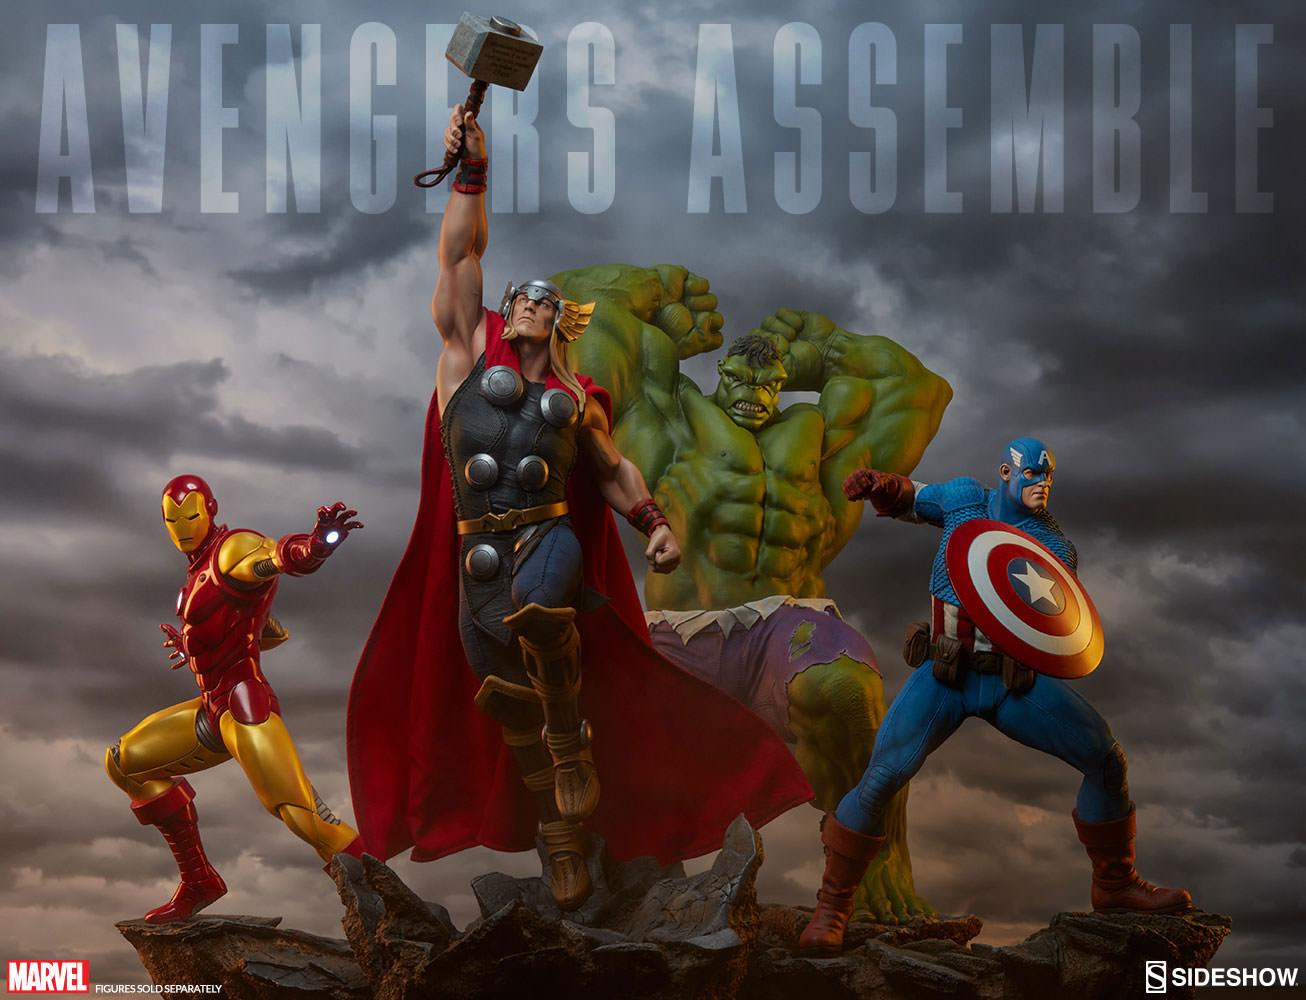 sideshow-hulk-avengers-assemble-statue-6